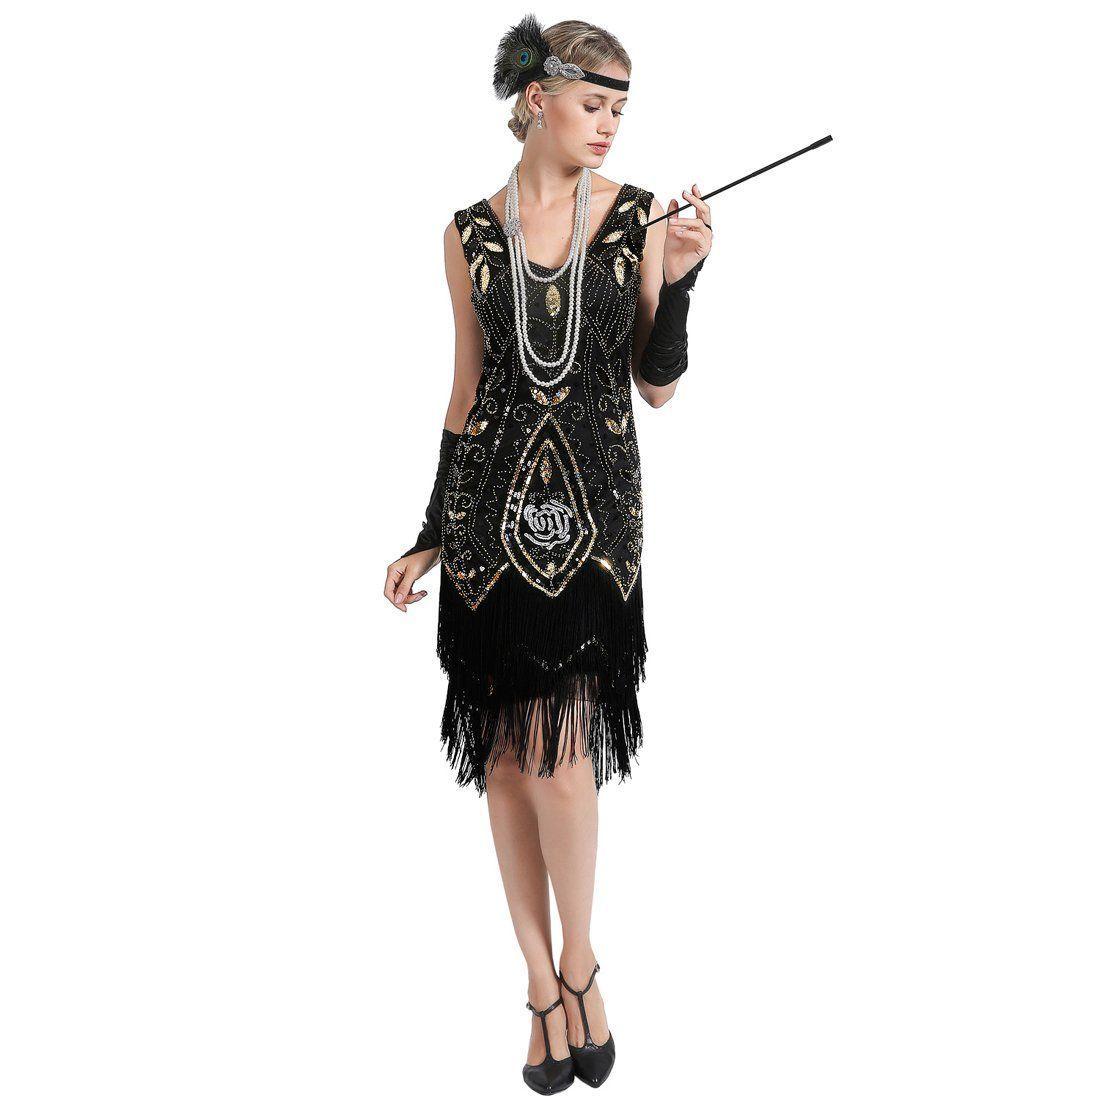 Black Gold 1920s Dress Peony Print Great Gatsby Outfits Great Gatsby Outfits Gatsby Outfit Gatsby Inspired Dress [ 1100 x 1100 Pixel ]